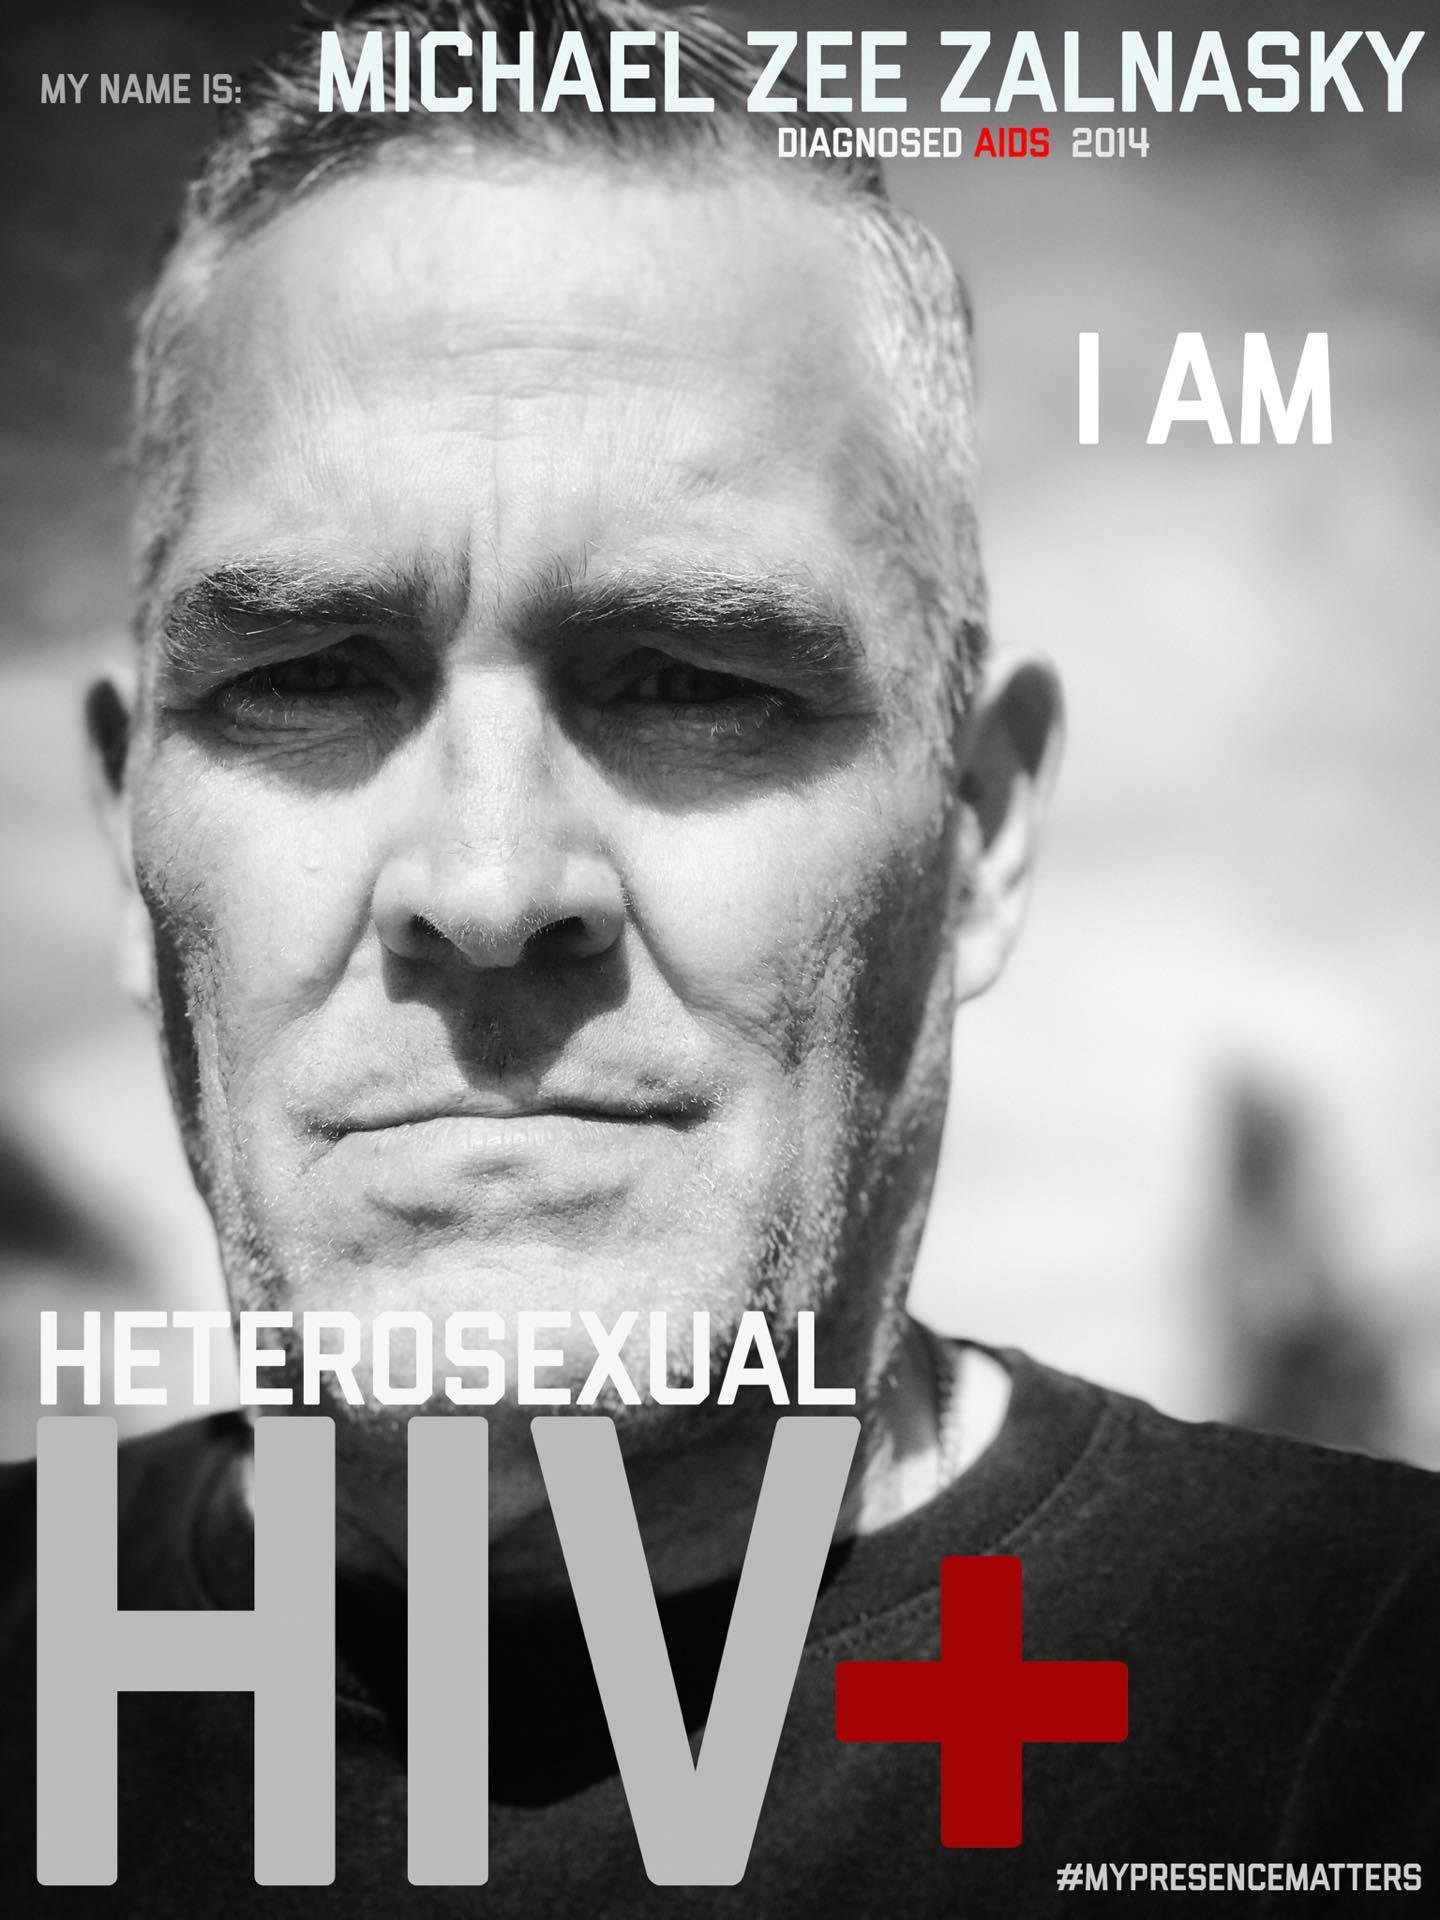 What is a heterosexual male